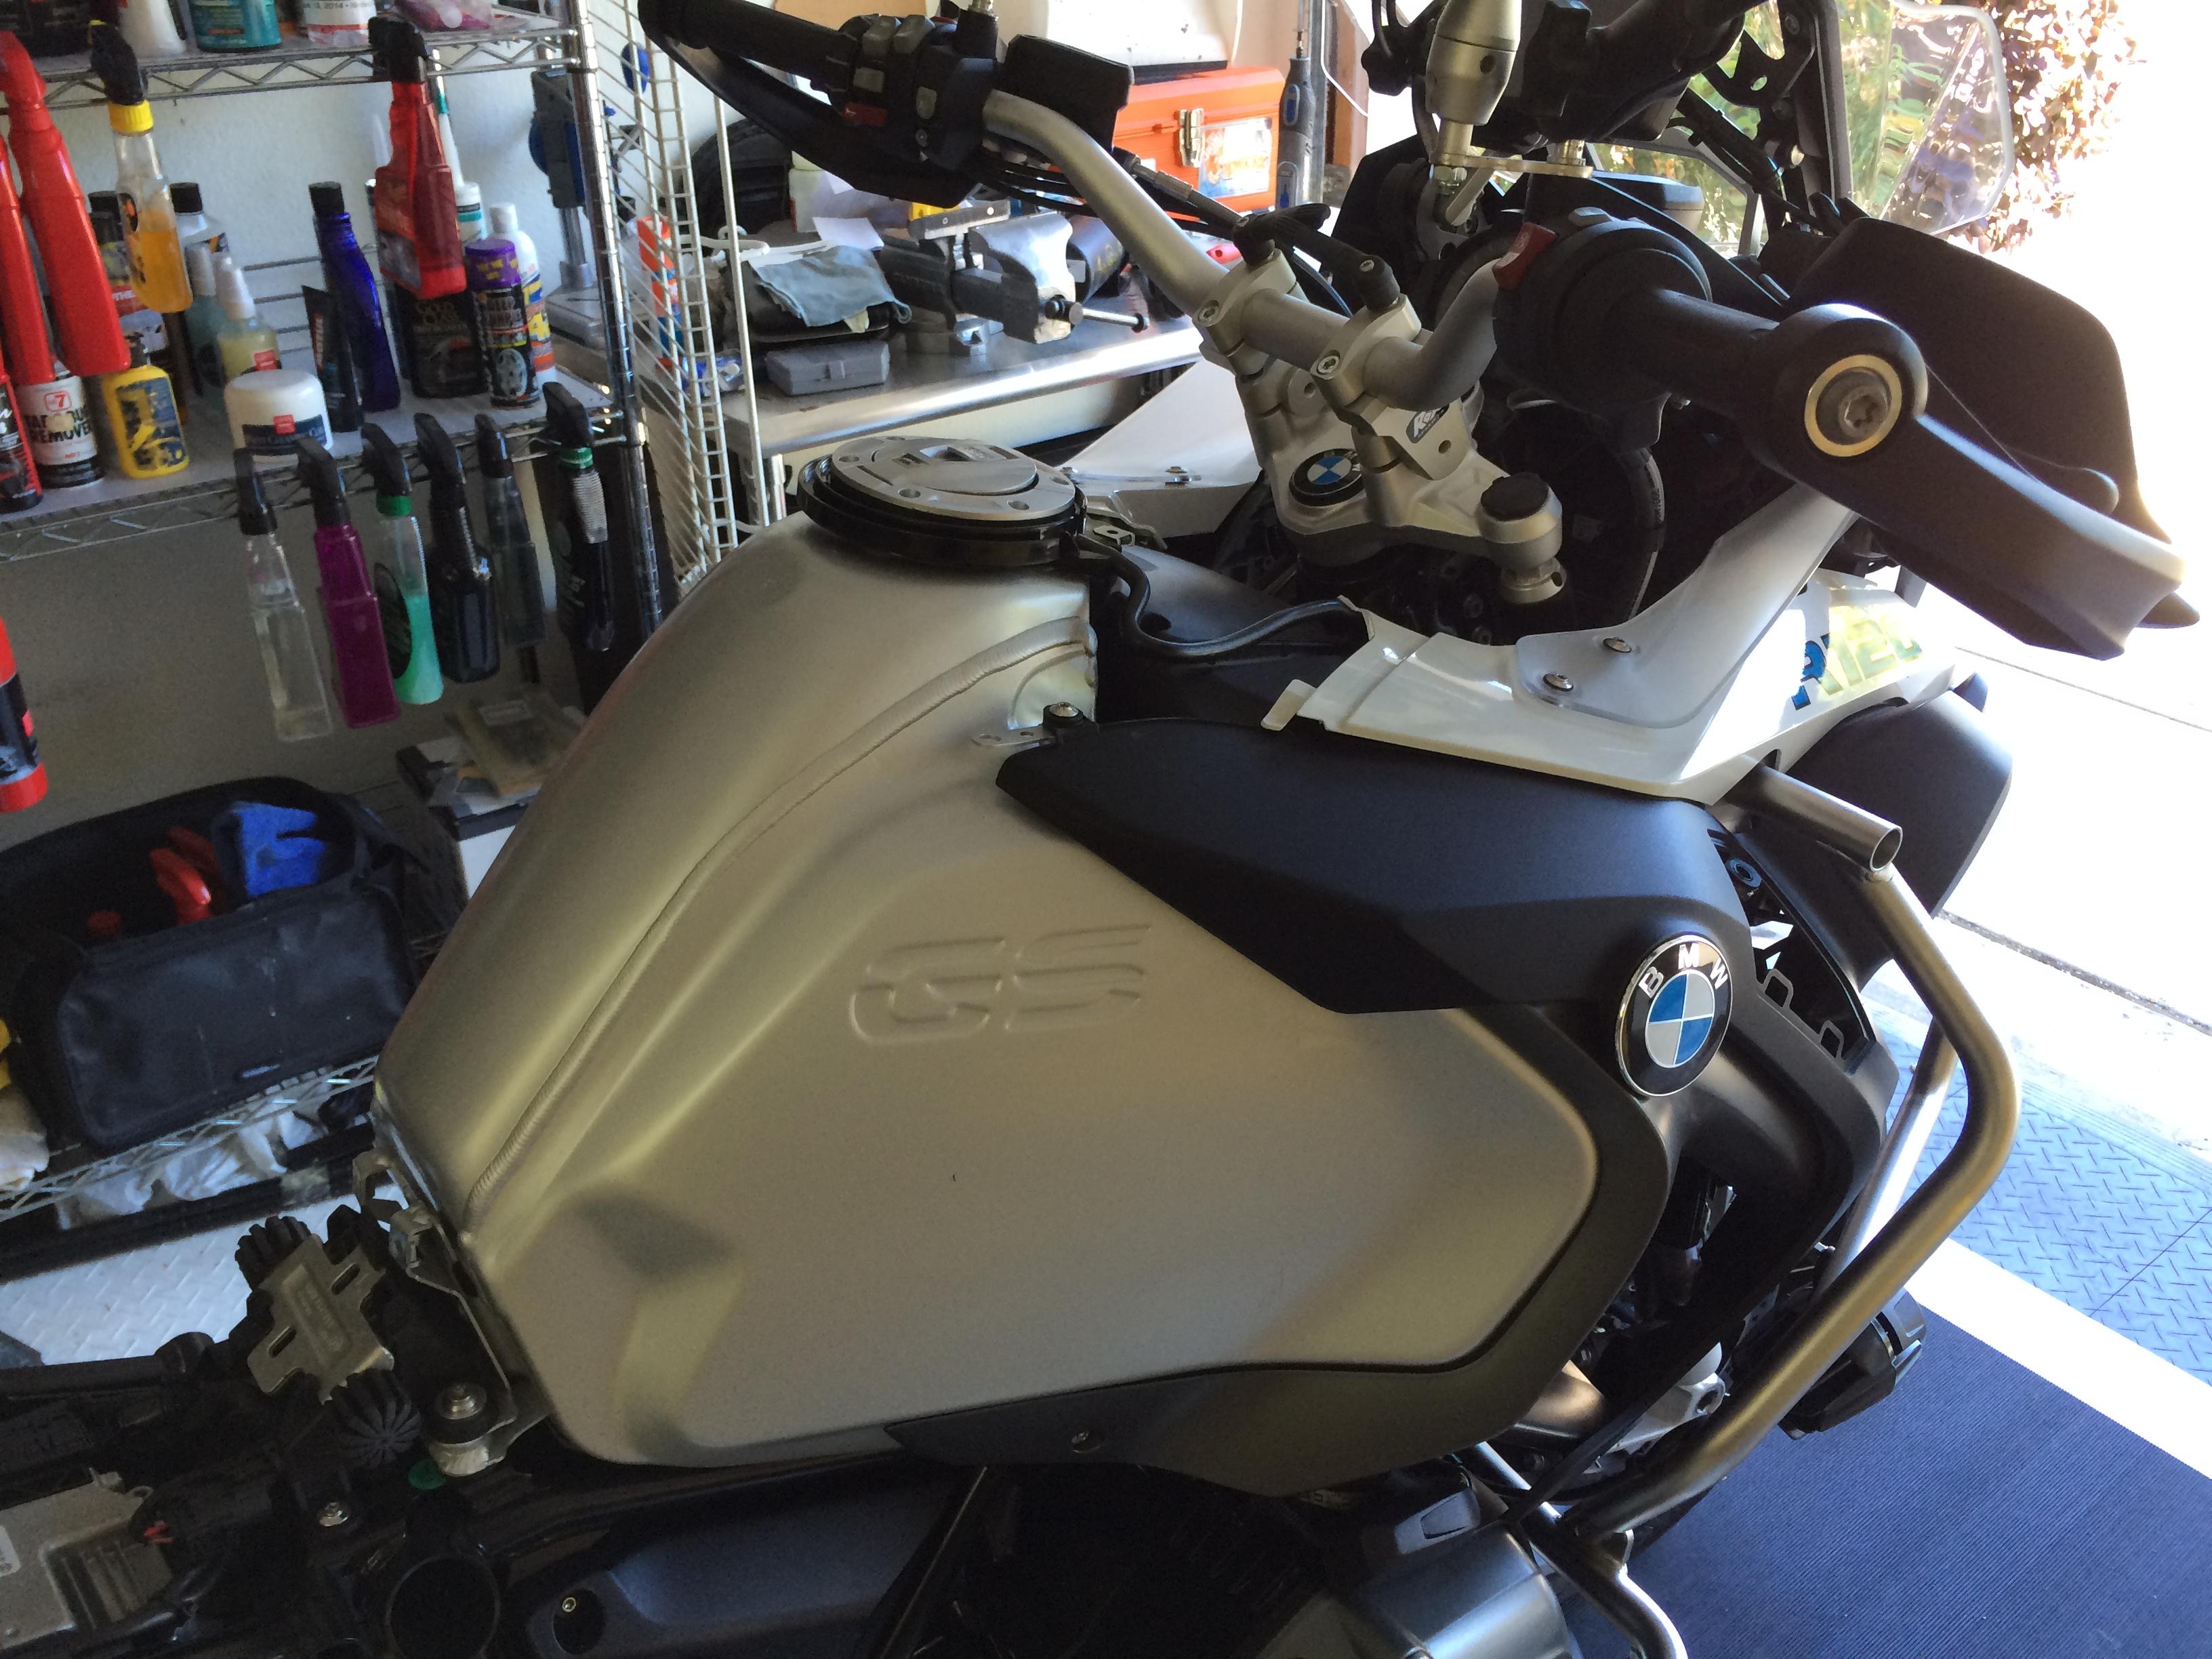 2015 GSA – The Vinyl Wrap (Installation) - Motorcycle Cliff